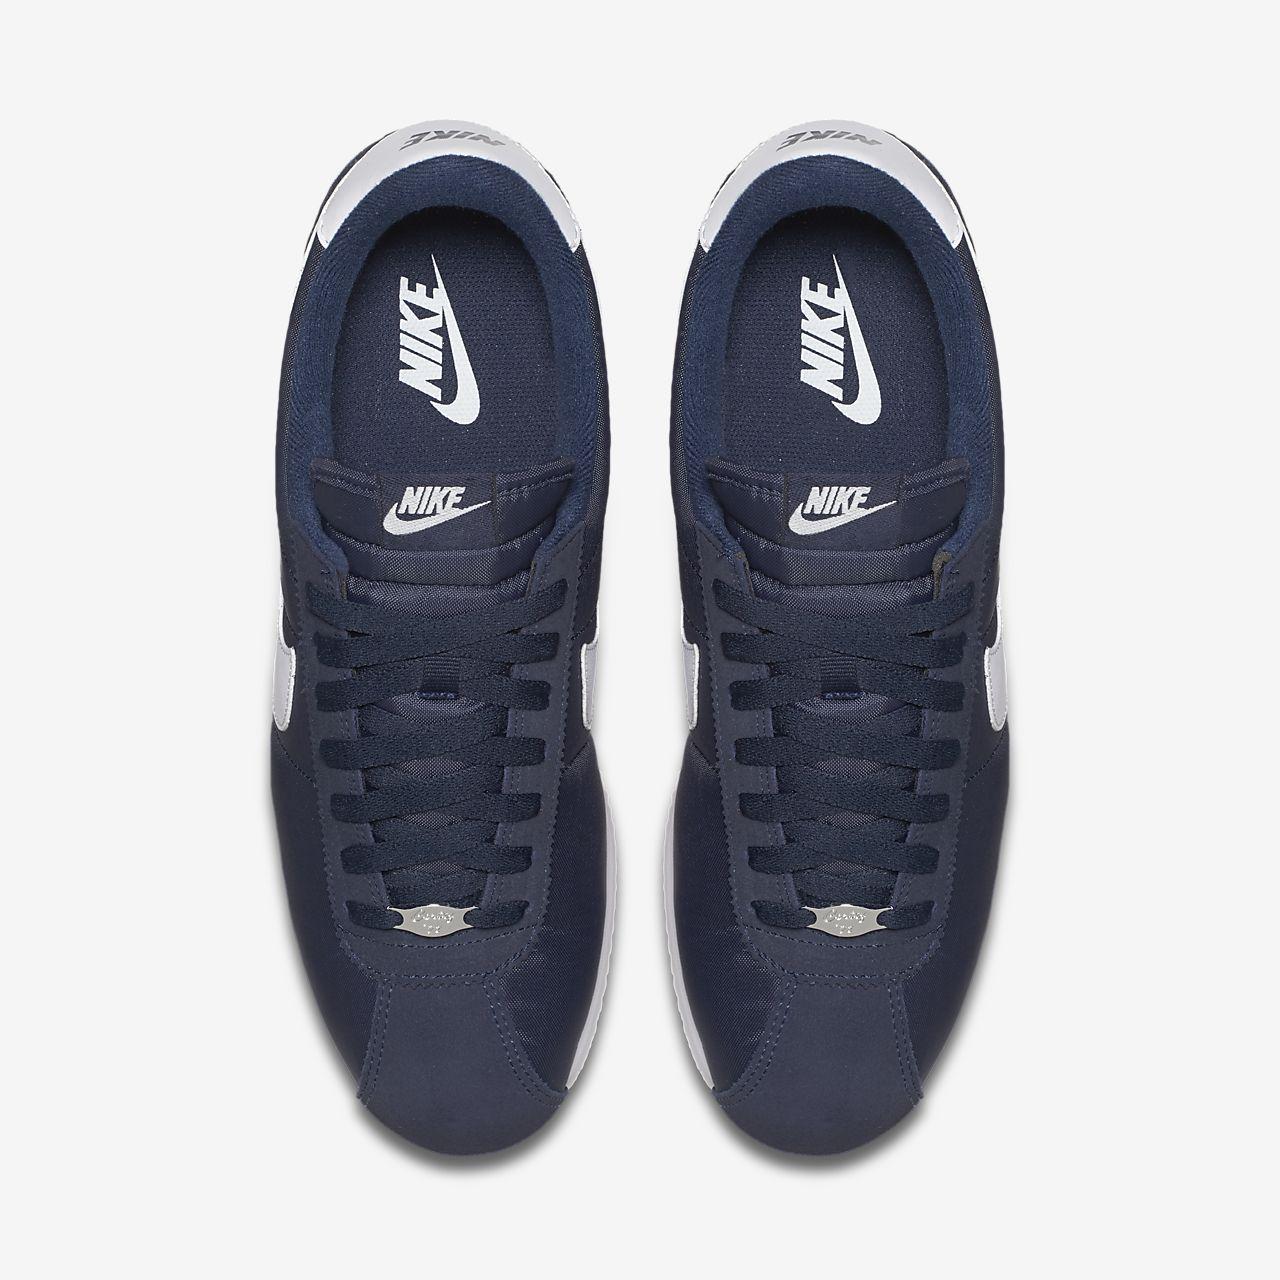 new styles be781 cca11 ... Nike Cortez Basic Nylon Men s Shoe